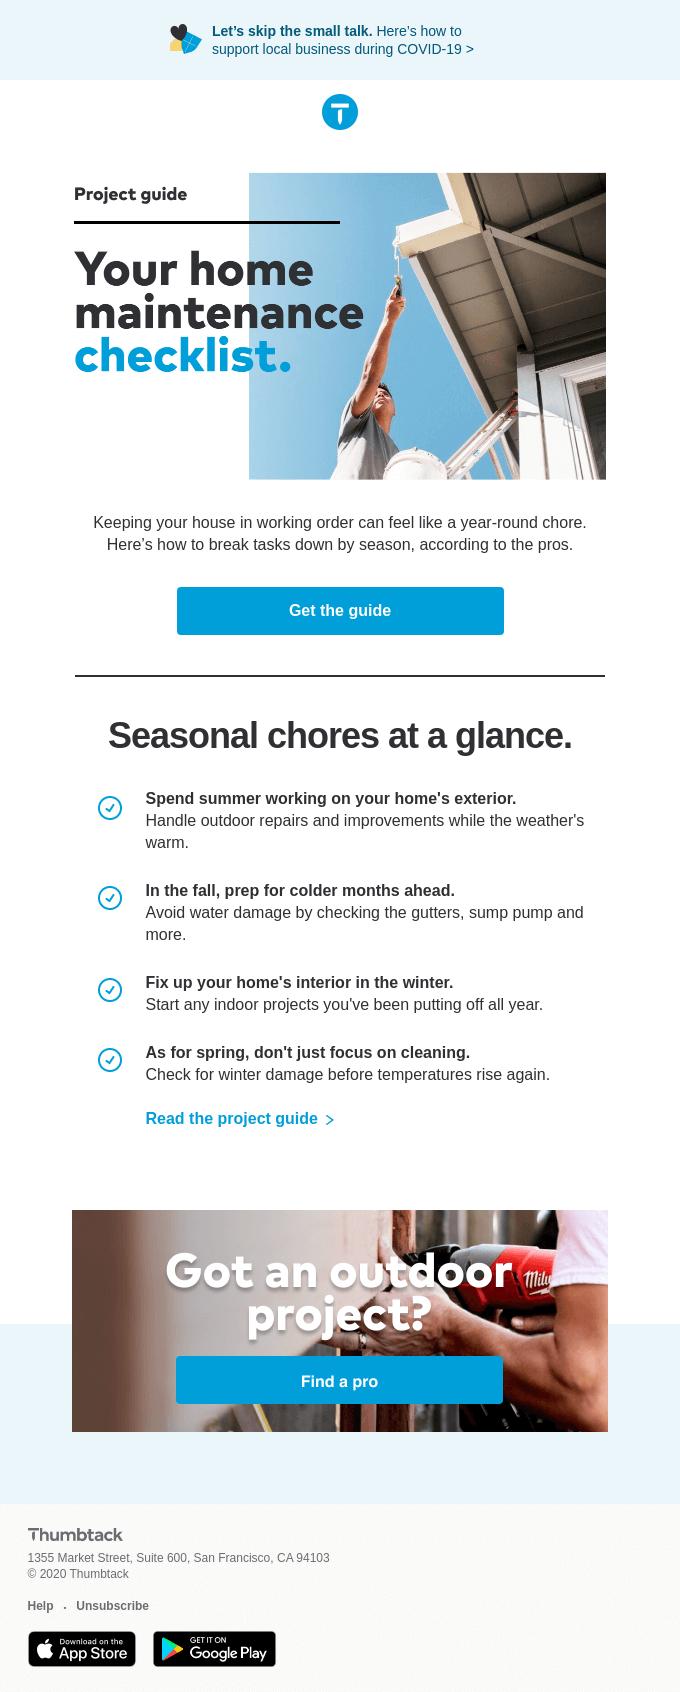 Home maintenance by the season